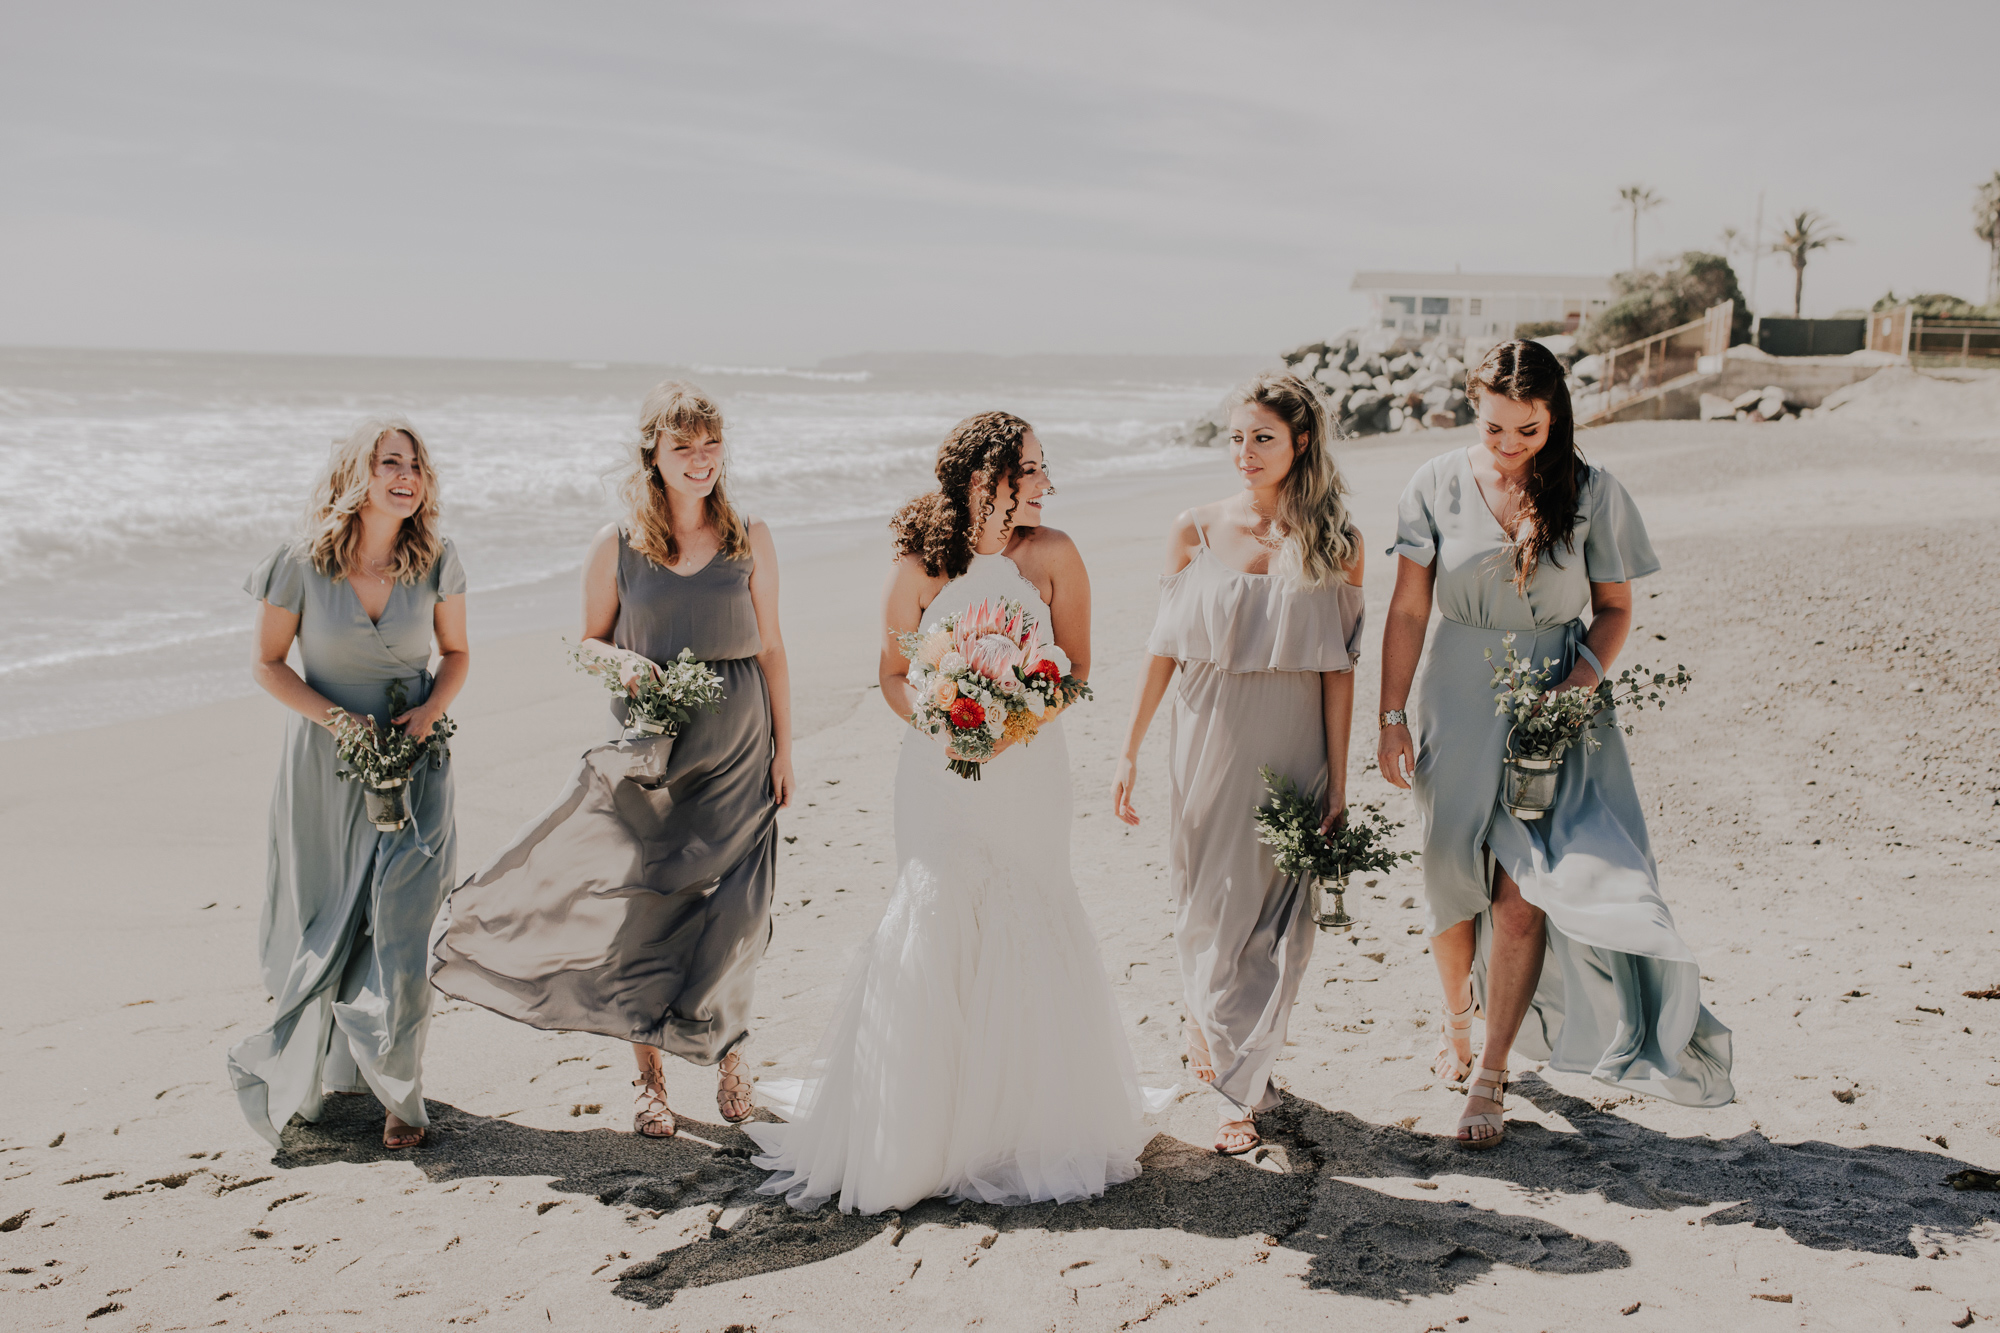 066-destination-wedding-san-clemente-california.jpg